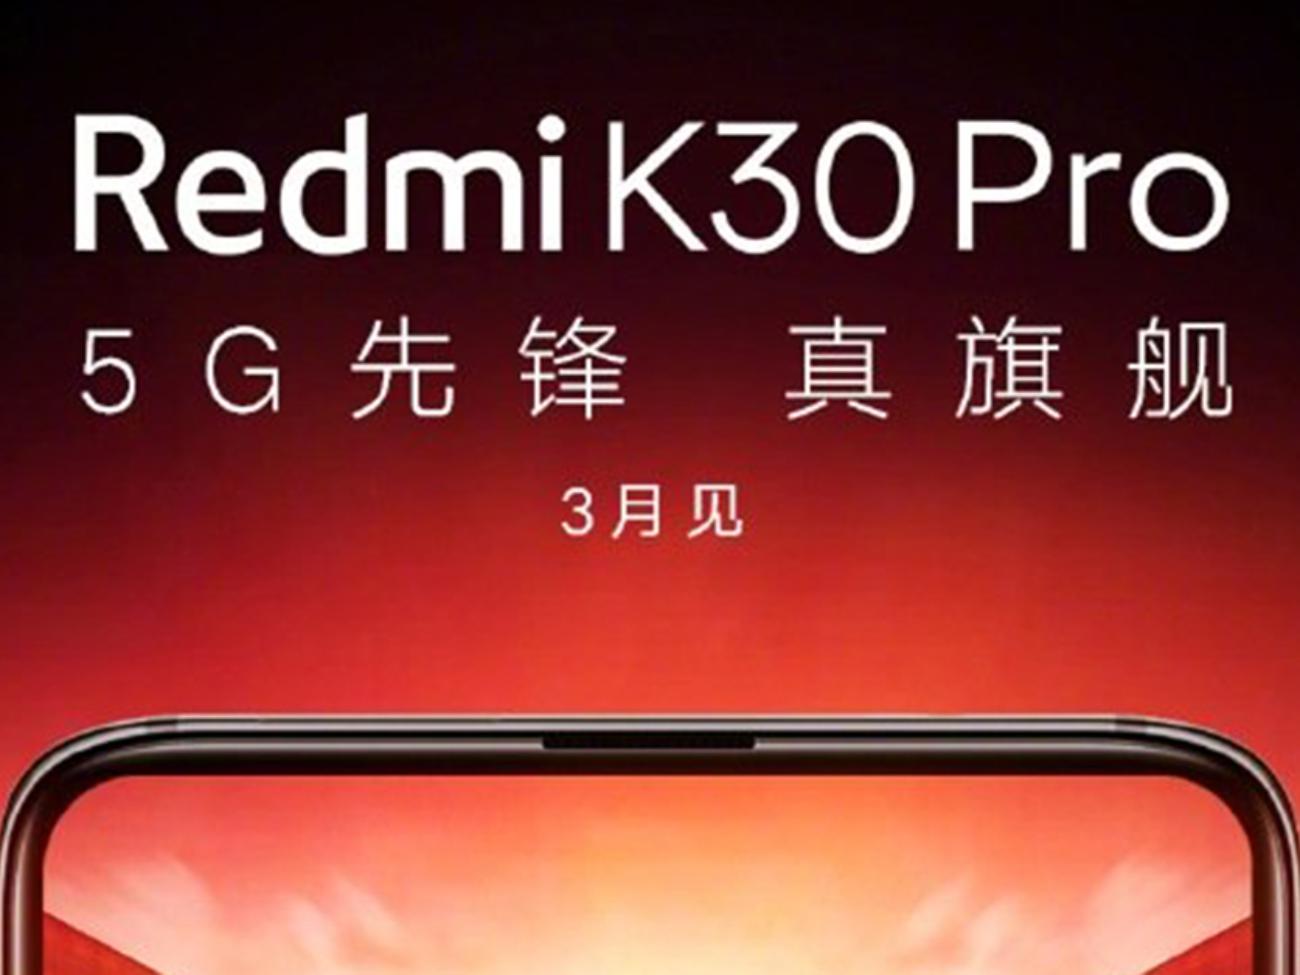 Redmi-K30-Pro-poster